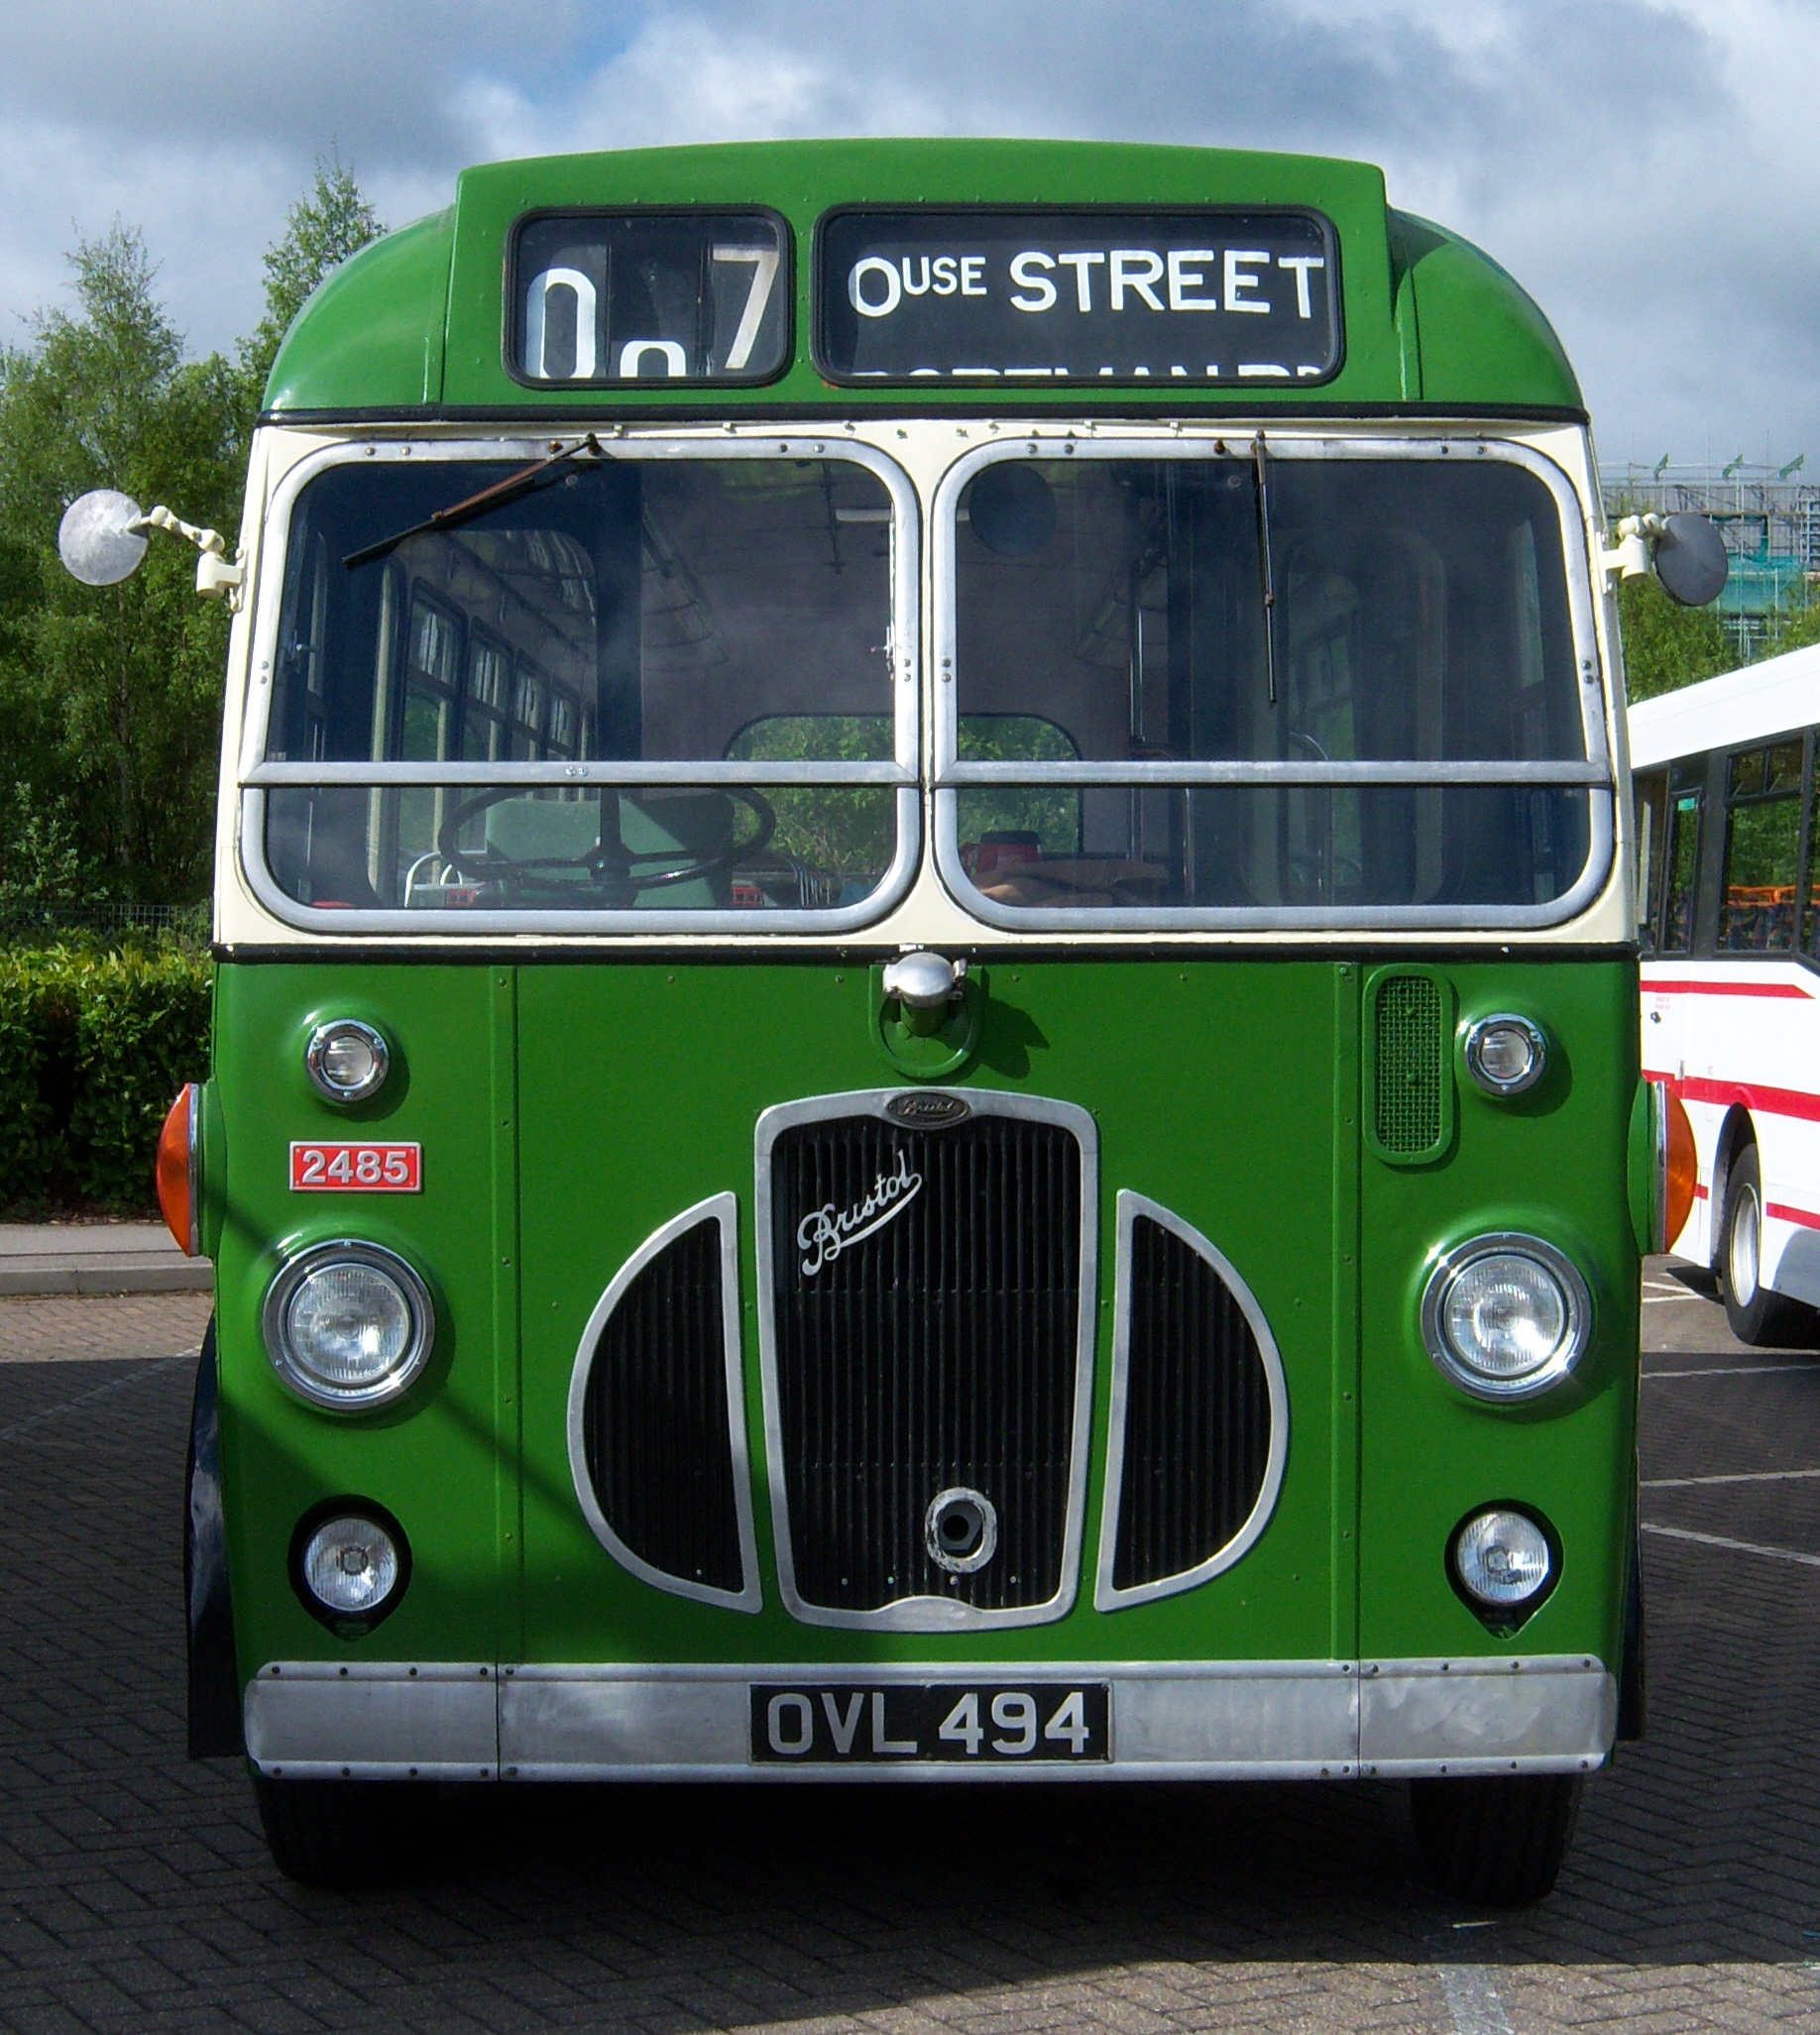 File:Lincolnshire bus 2485 Bristol SC4LK ECW OVL 494 Metrocentre rally 2009  (2)